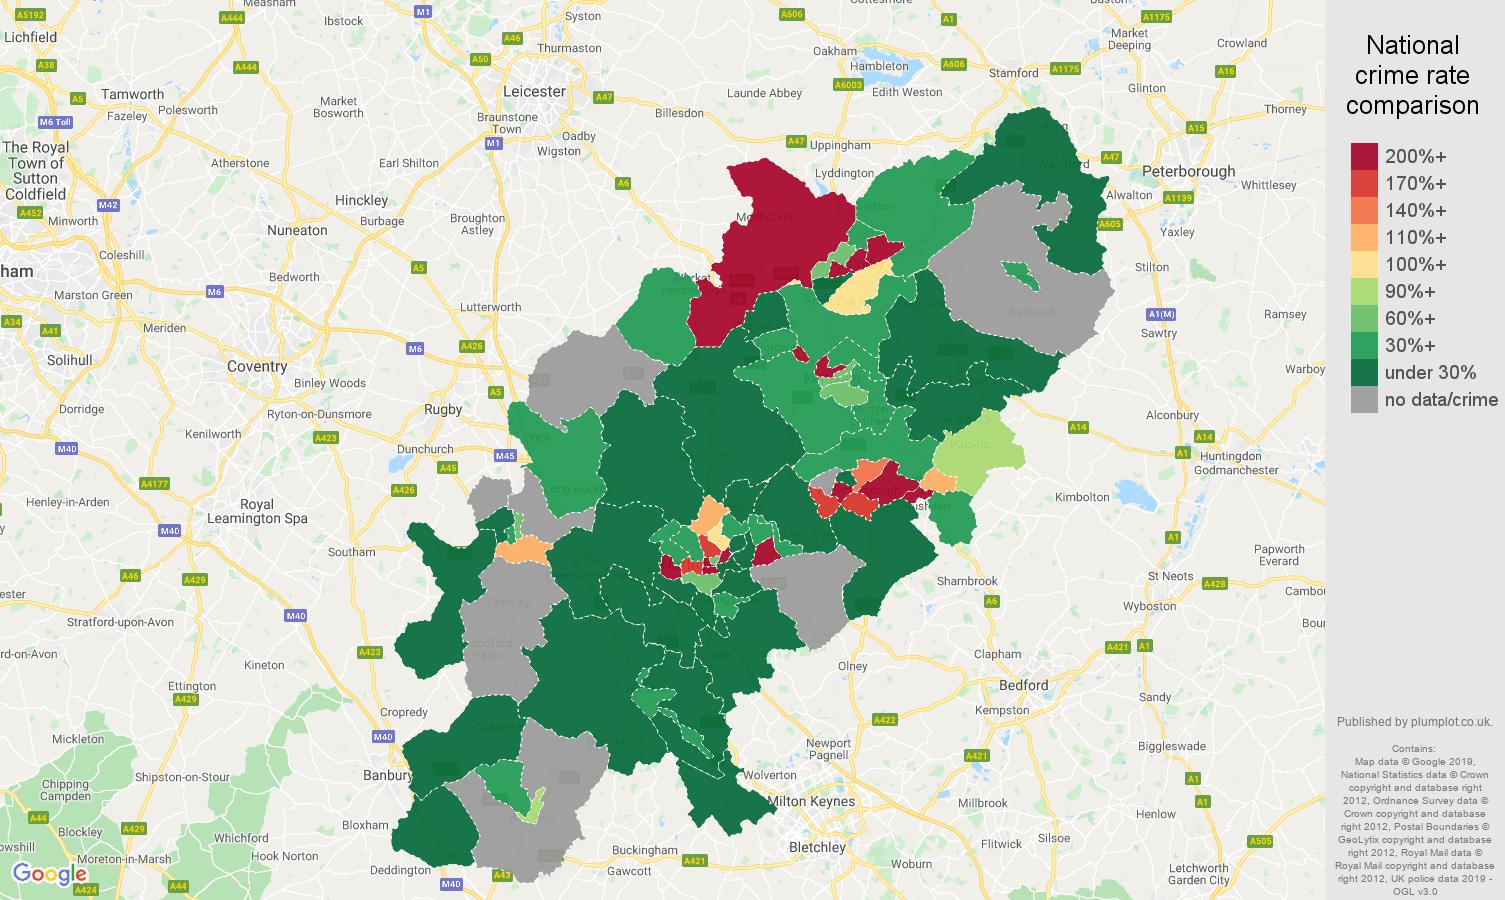 Northamptonshire shoplifting crime rate comparison map